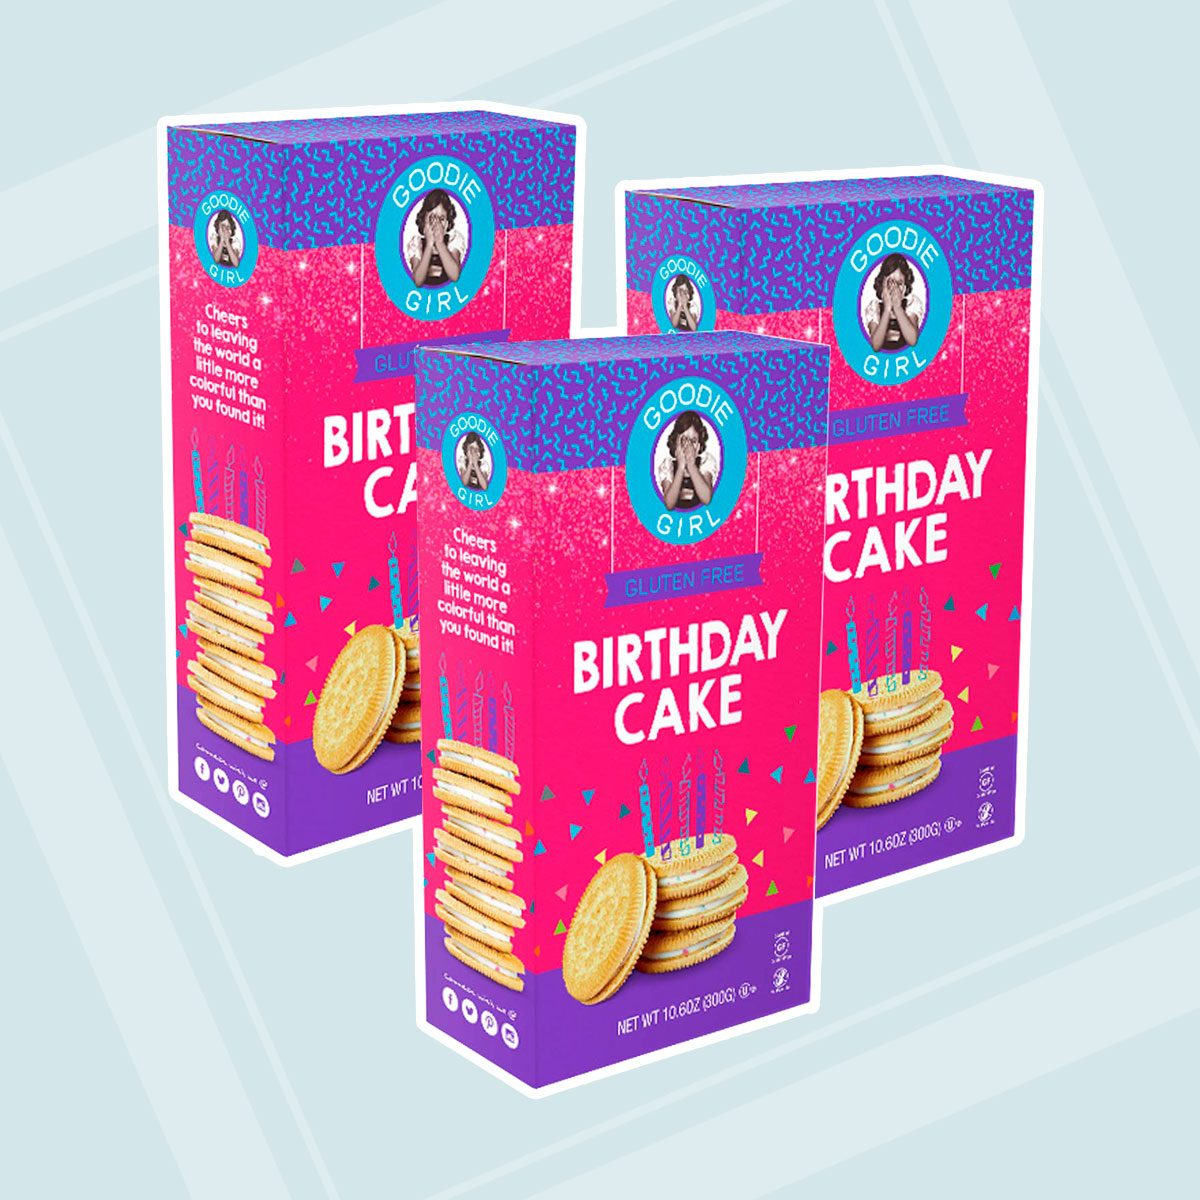 Goodie Girl Birthday Cake Sandwich Cookies